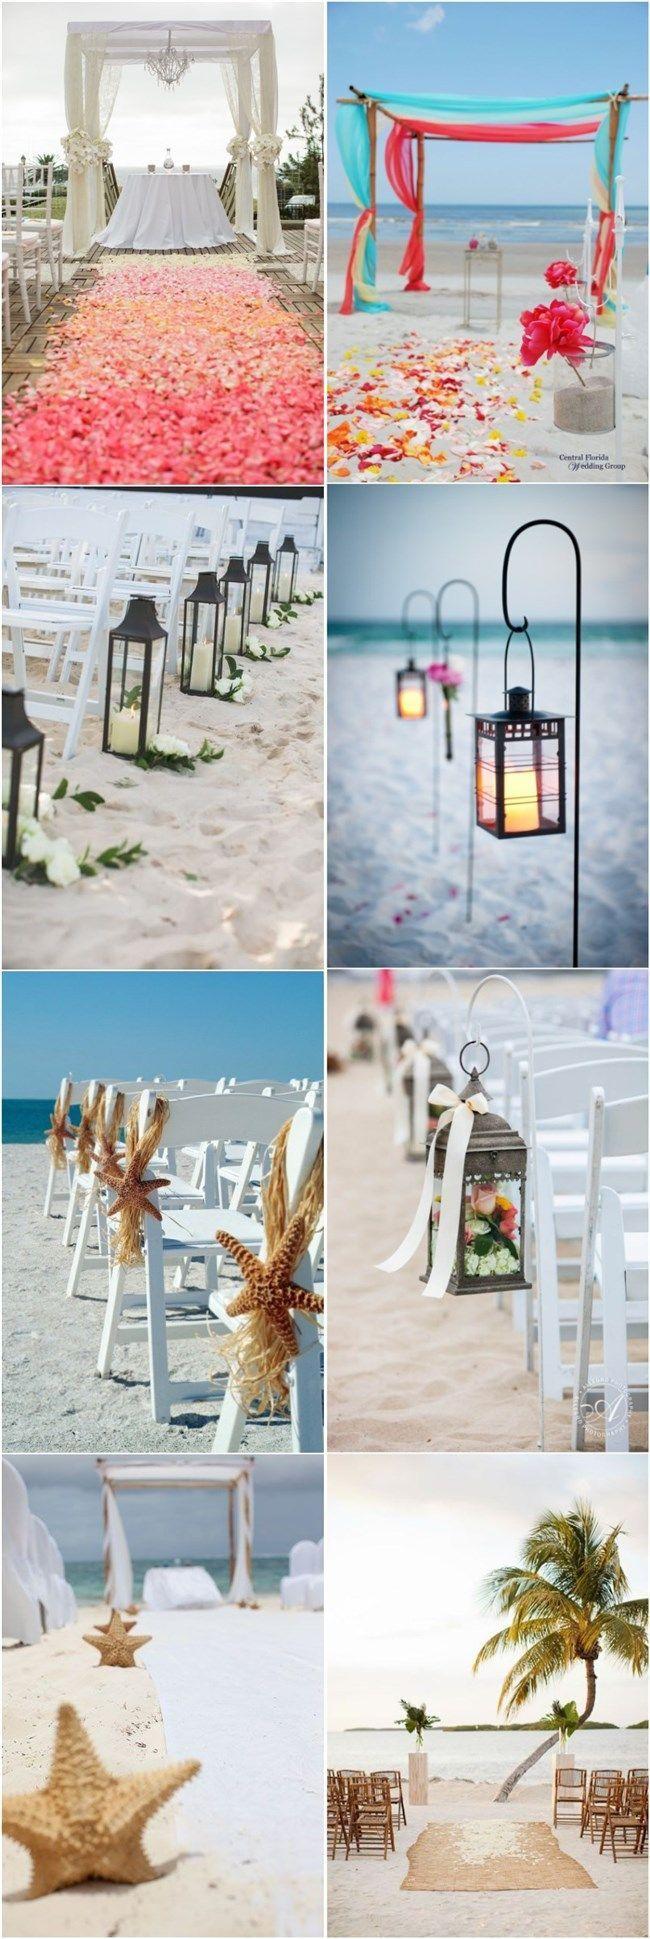 Best 25 wedding aisles ideas on pinterest outdoor for Aisle decoration ideas